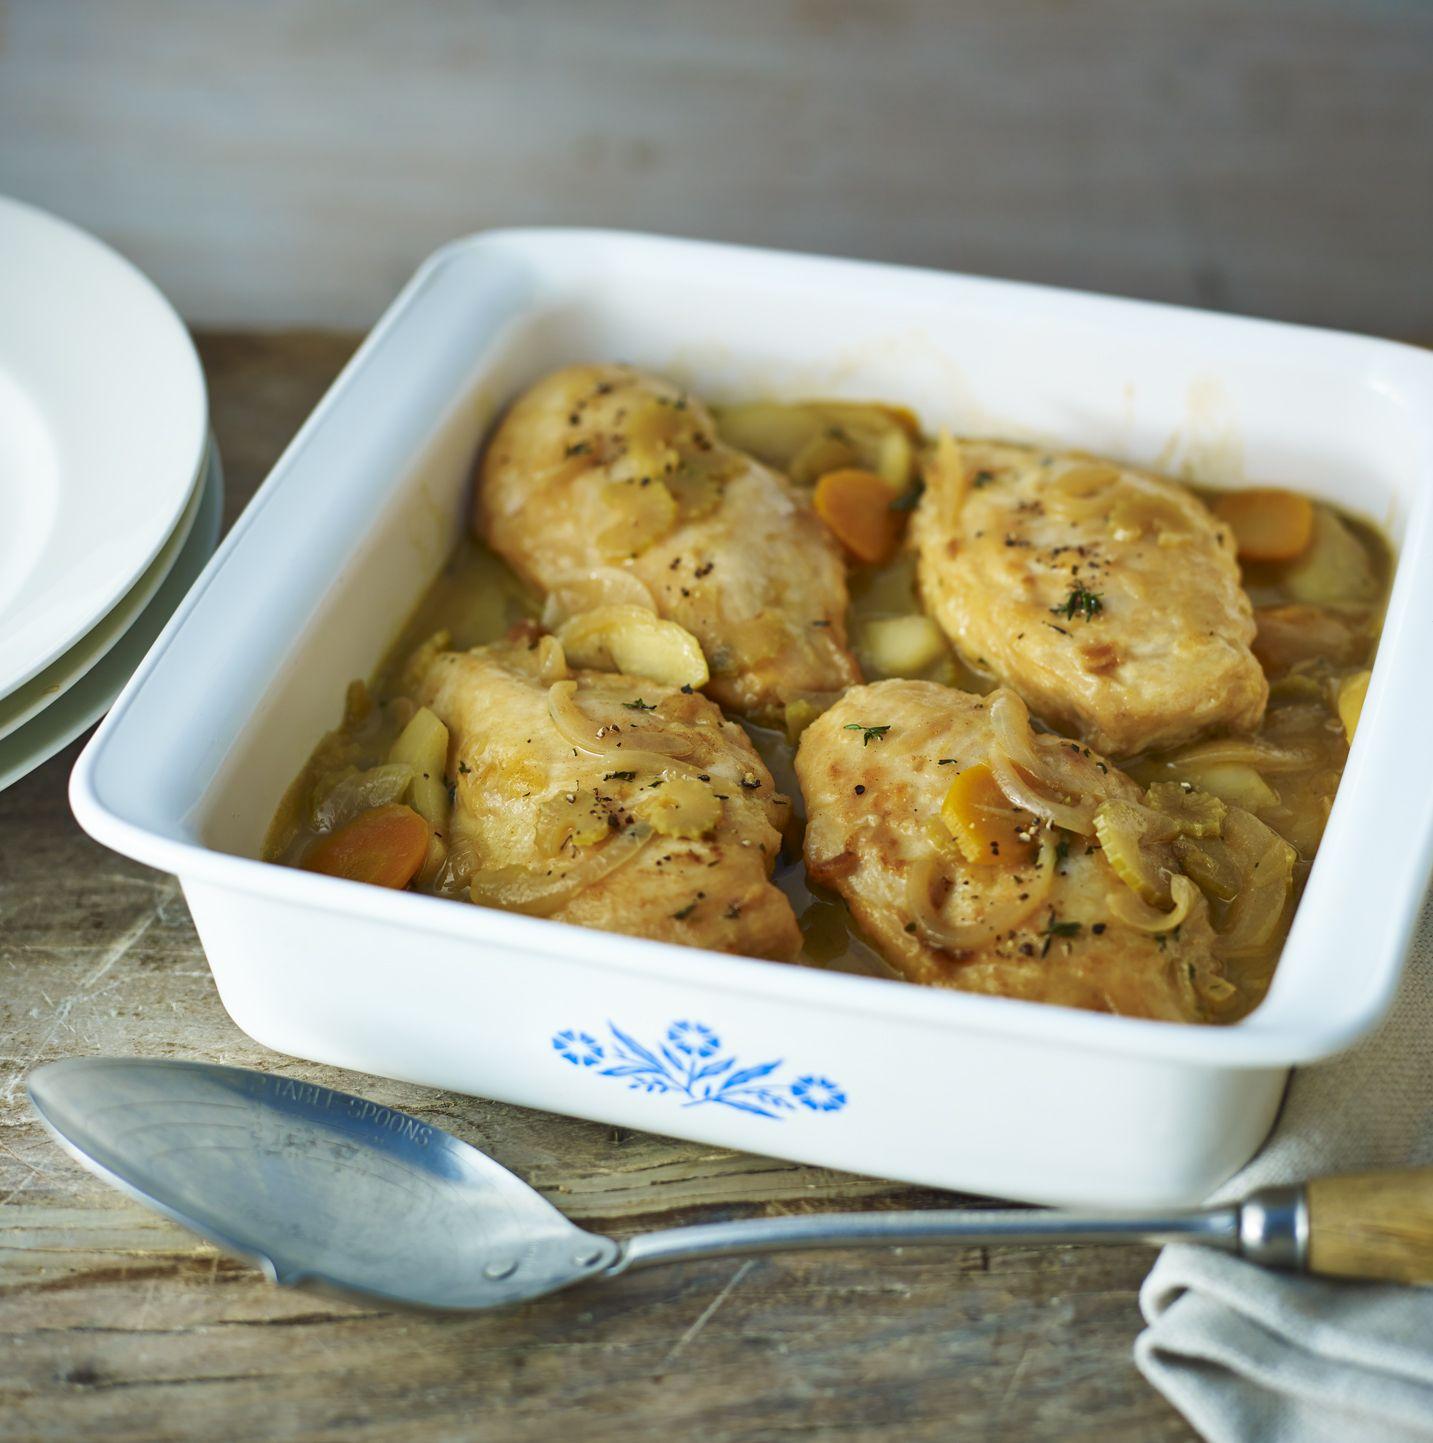 Chicken cider and apple casserole recipe chicken thighs chicken cider and apple casserole recipe chicken thighs chicken breasts and thighs forumfinder Gallery